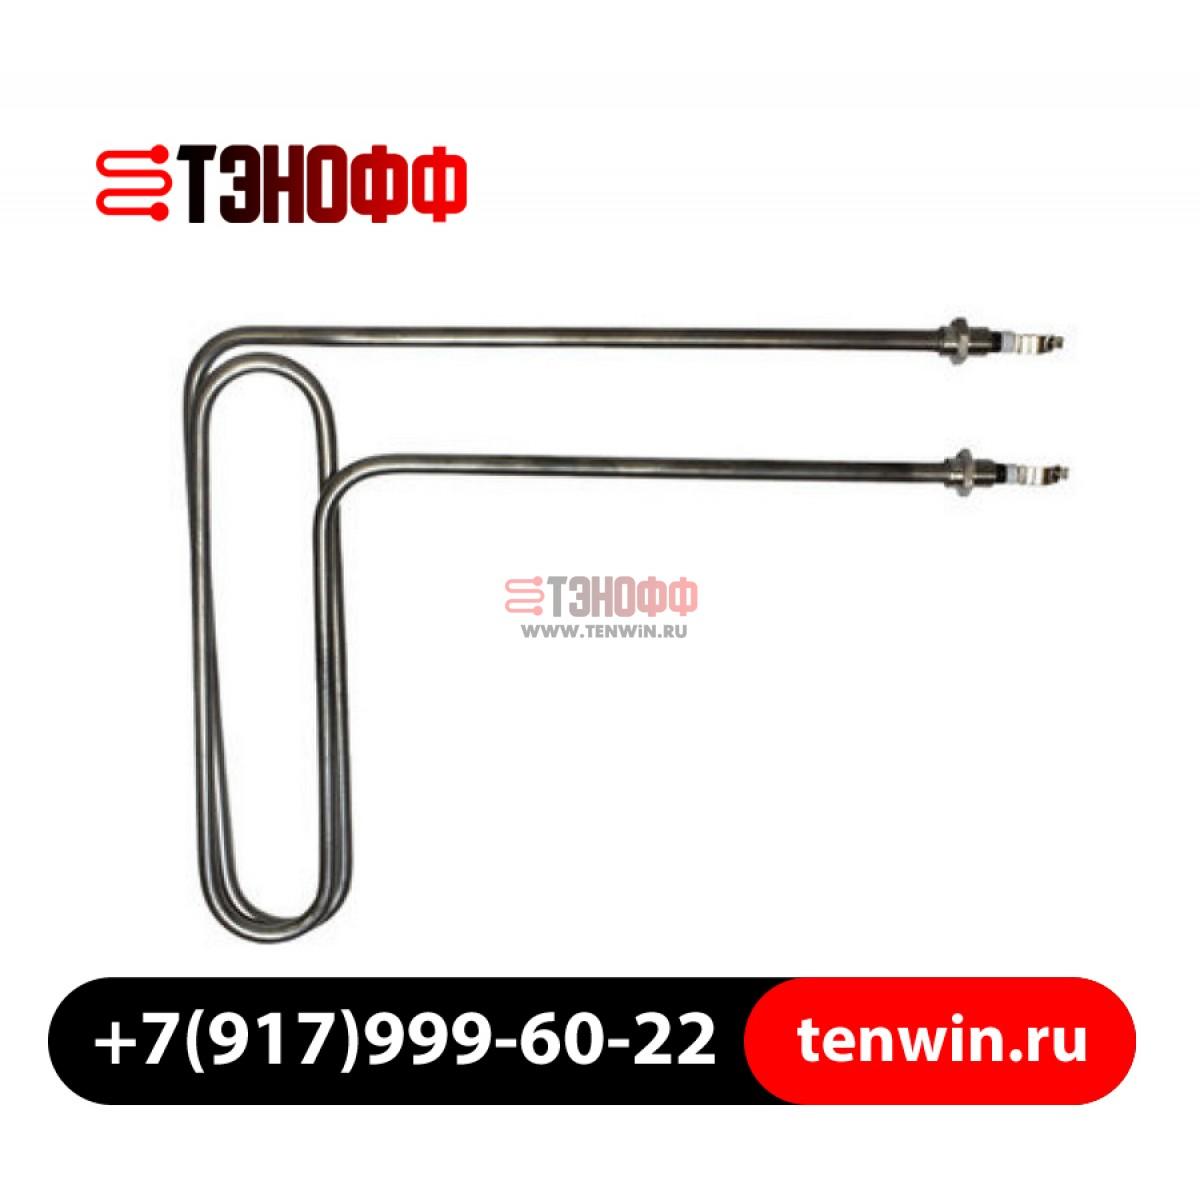 ТЭНы HARVIA ZSTM-260 / 3600W парогенератора